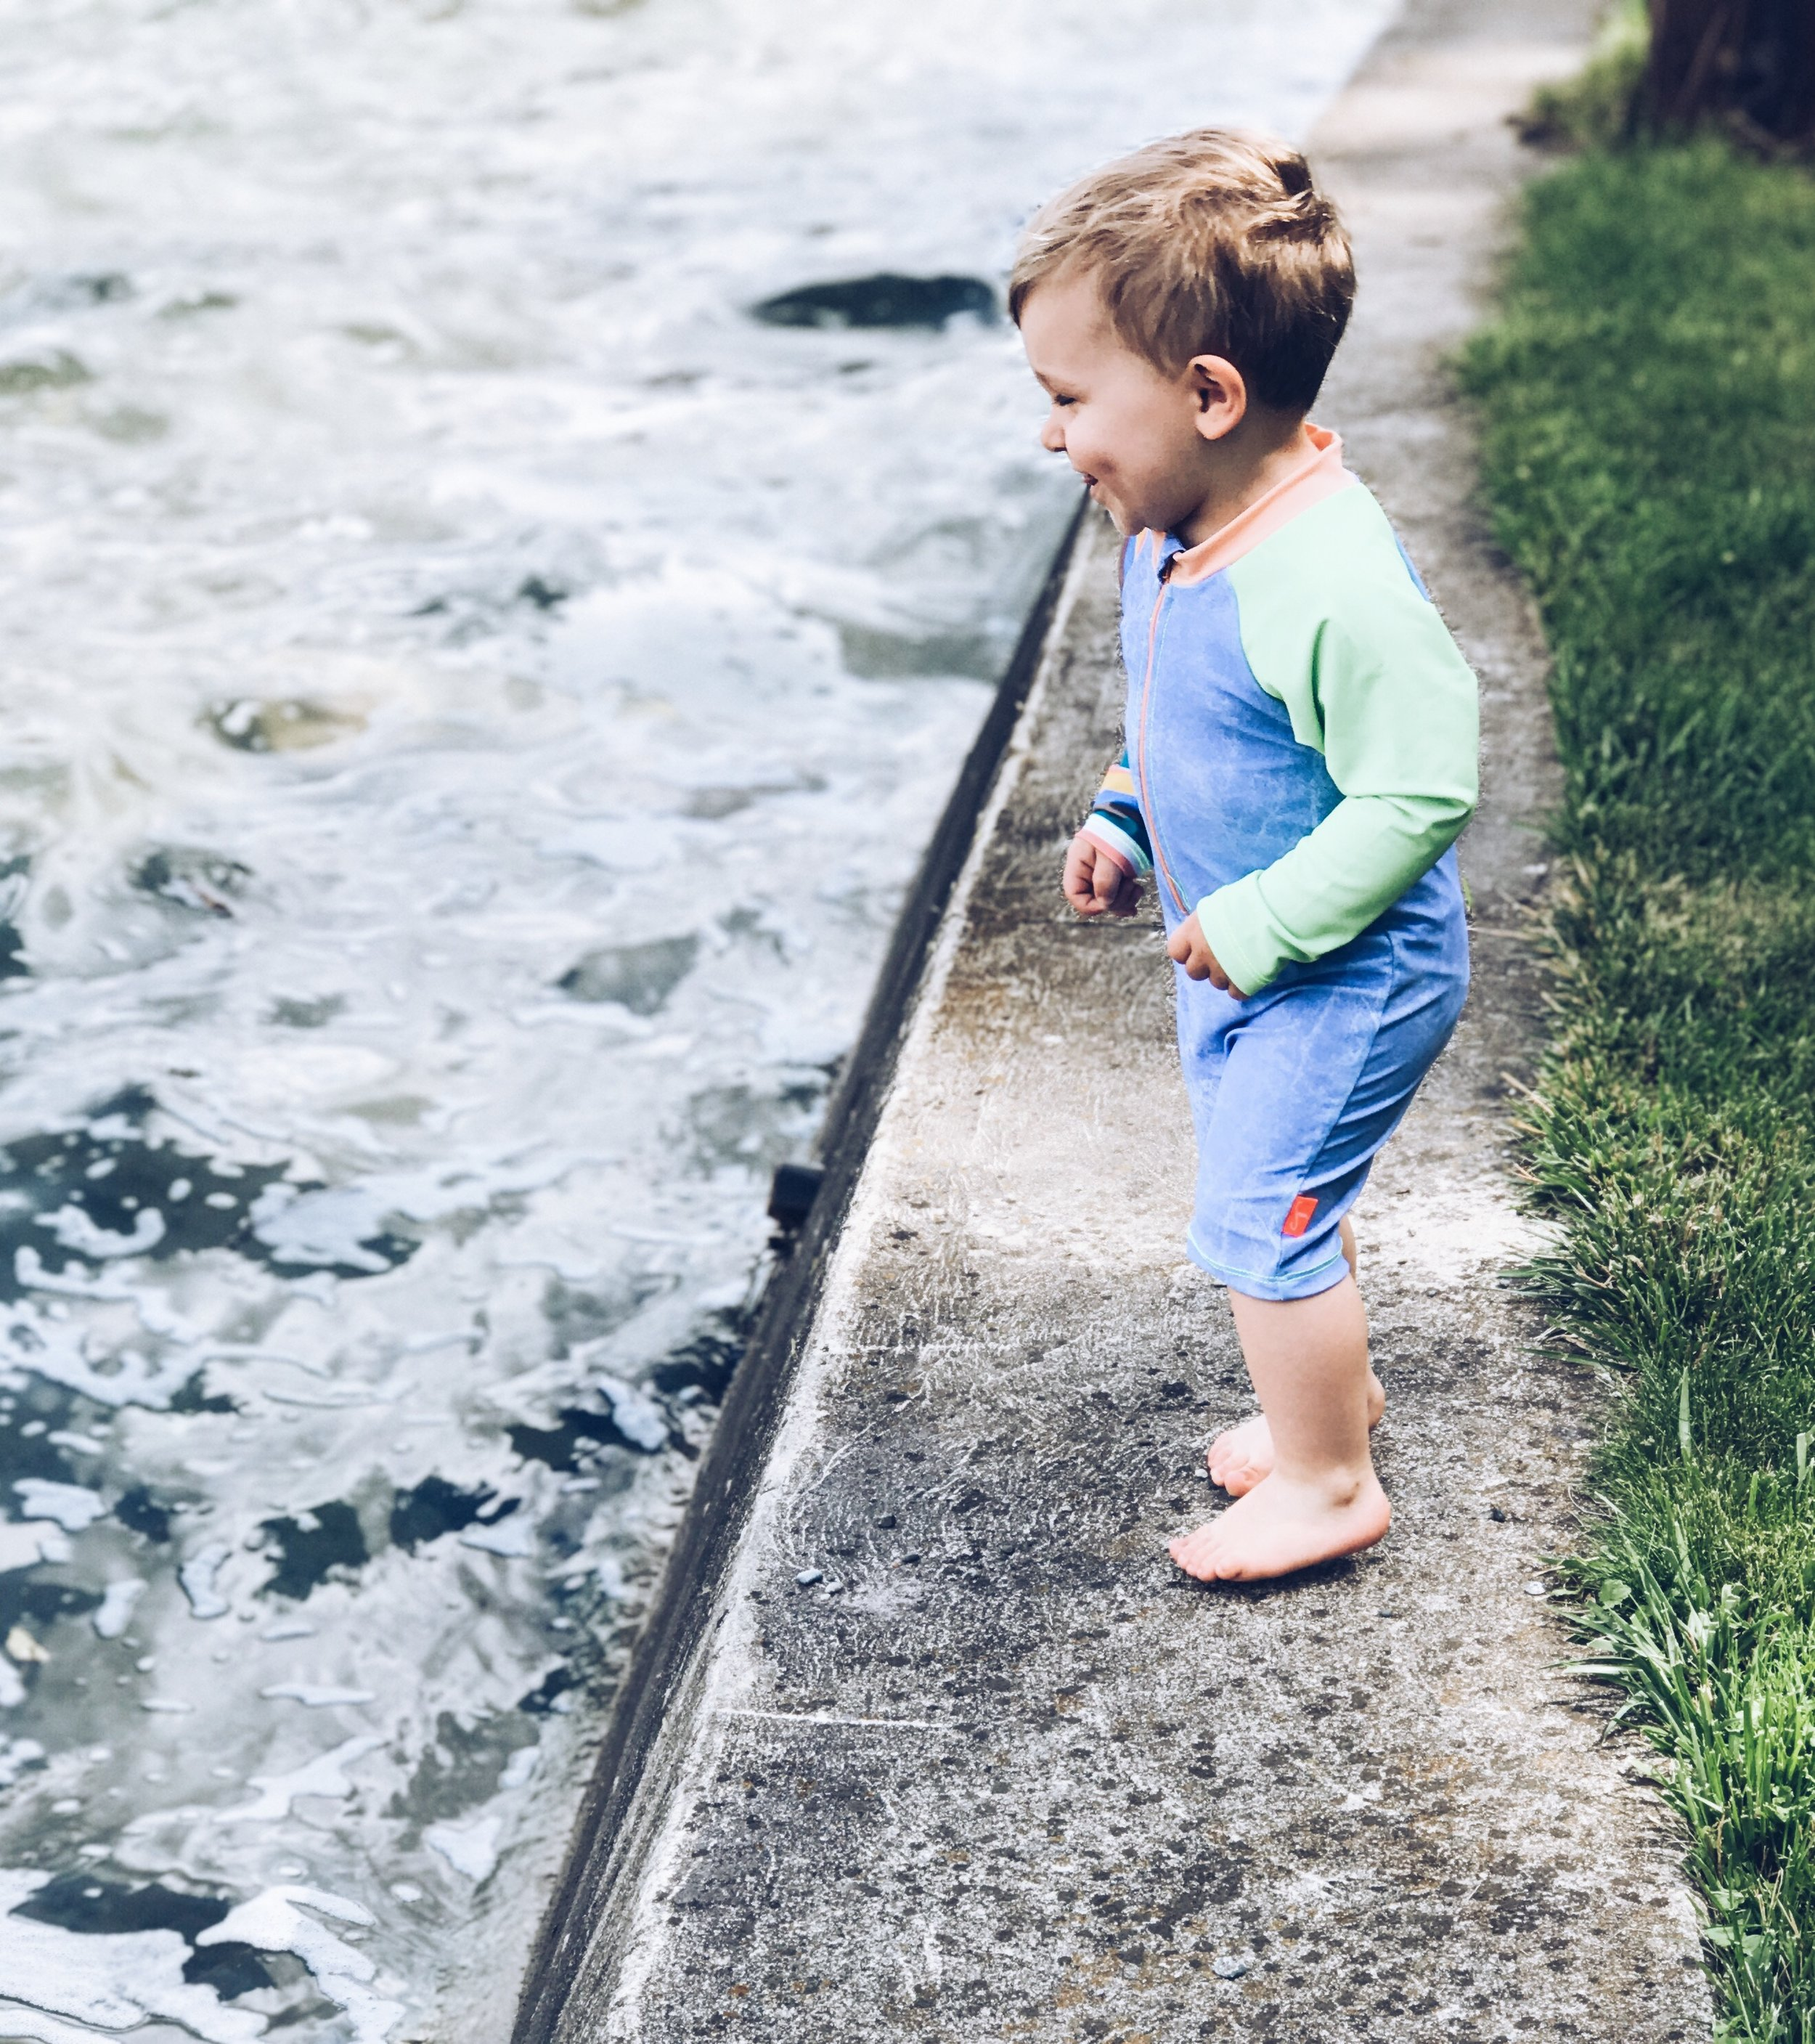 Seea Swimwear - Summer Essentials For Fun In The Sun